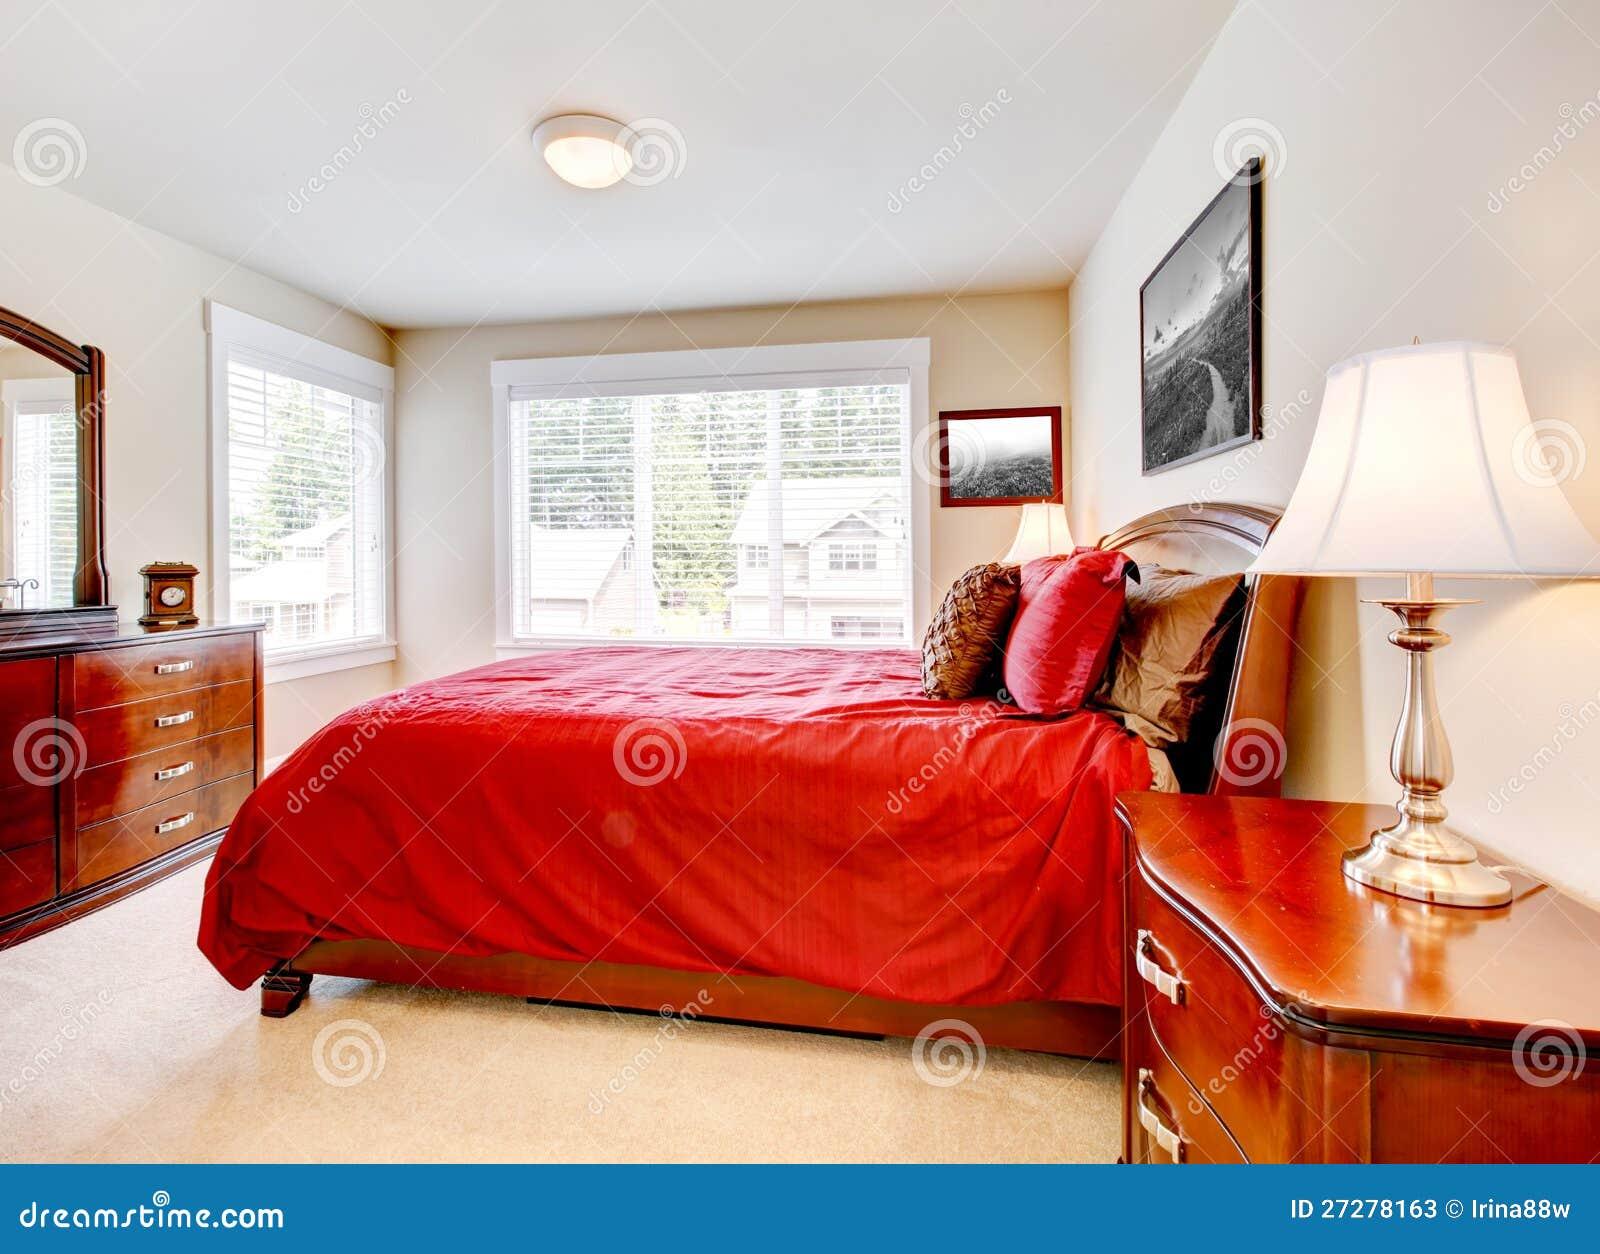 Beautiful Chambre A Coucher Rouge Et Beige Contemporary - Seiunkel ...